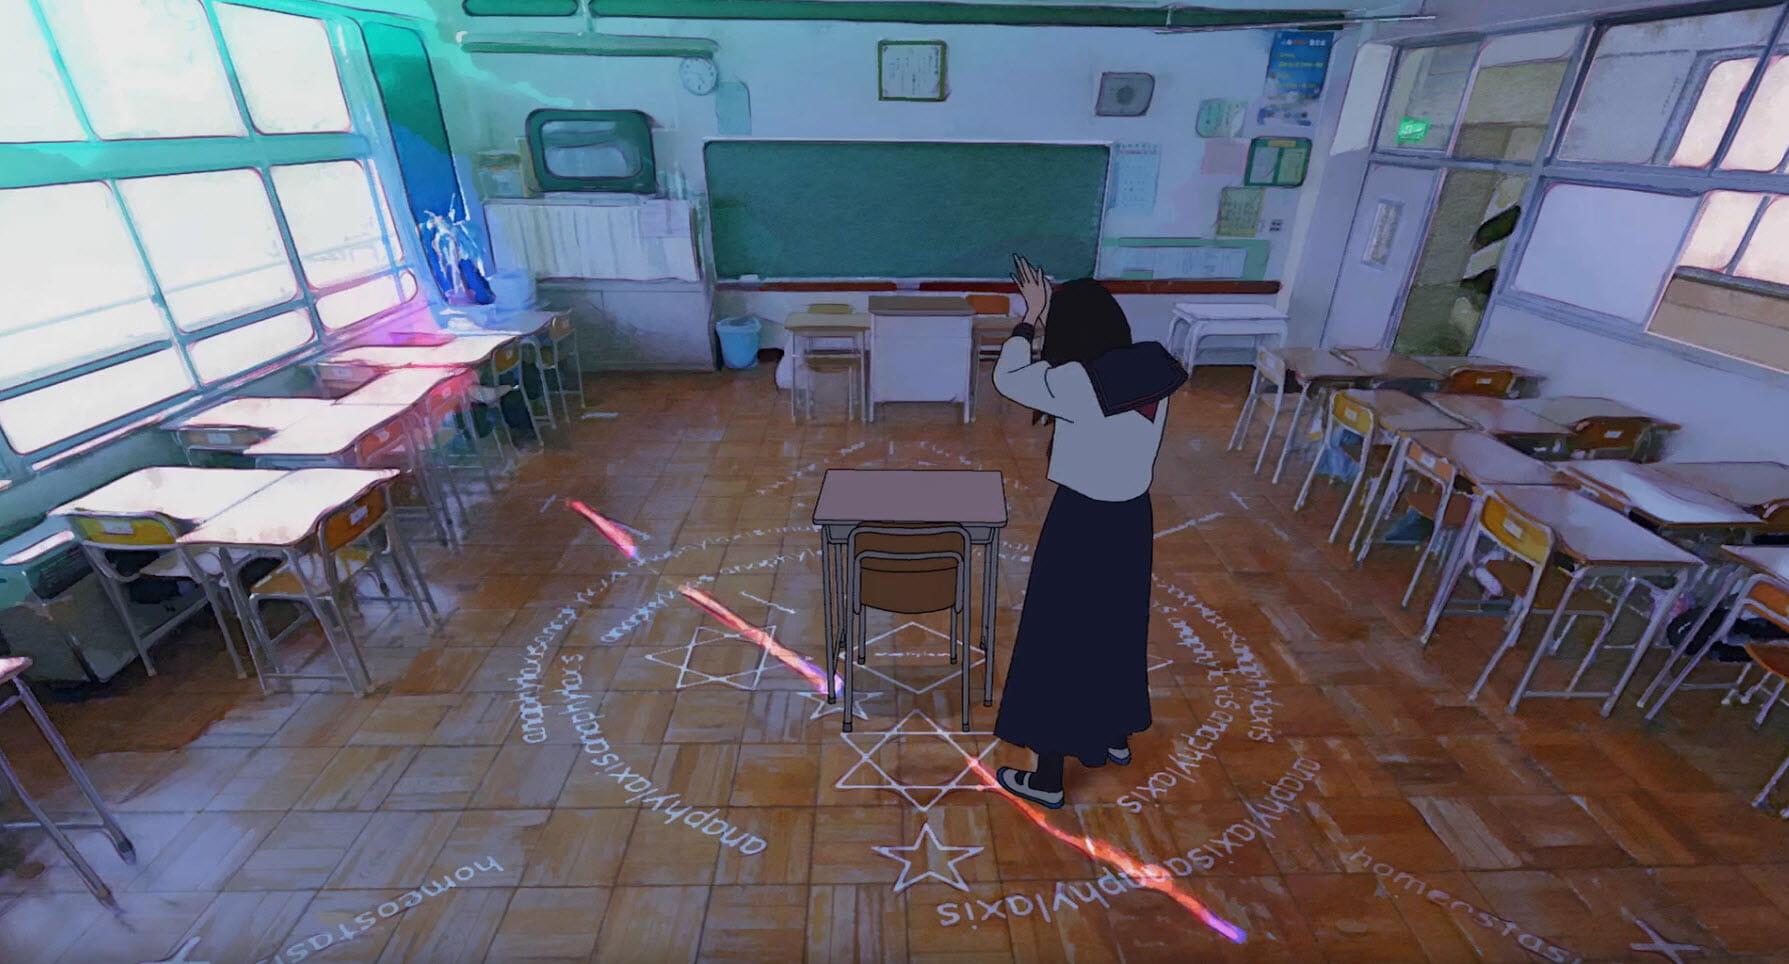 School rituals - Hana & Alice